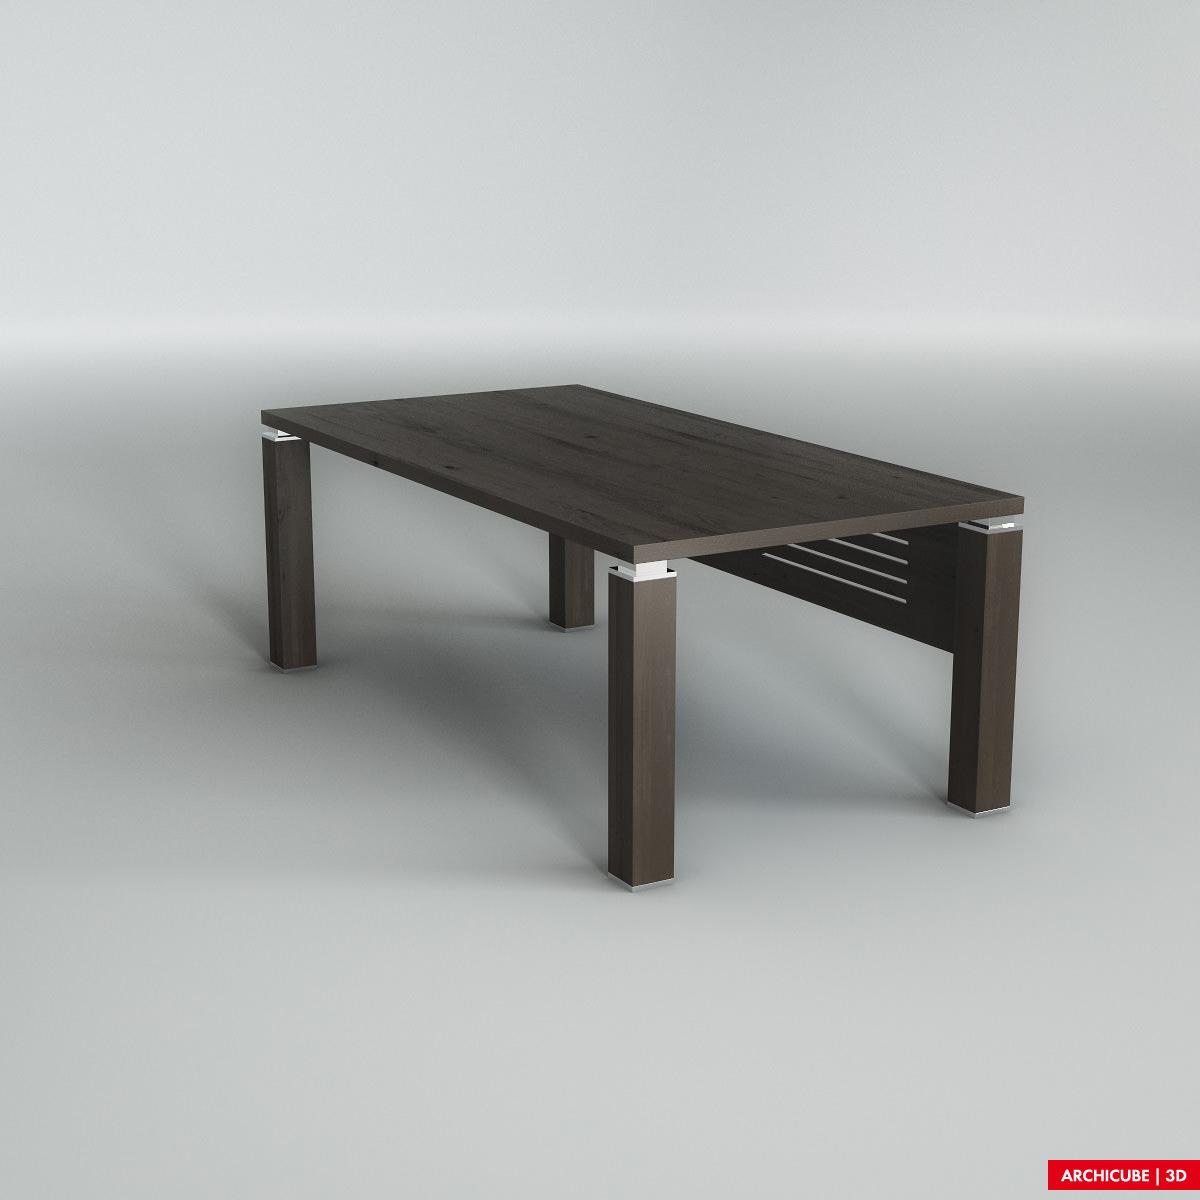 Table 3d model max obj fbx for Table 3d model